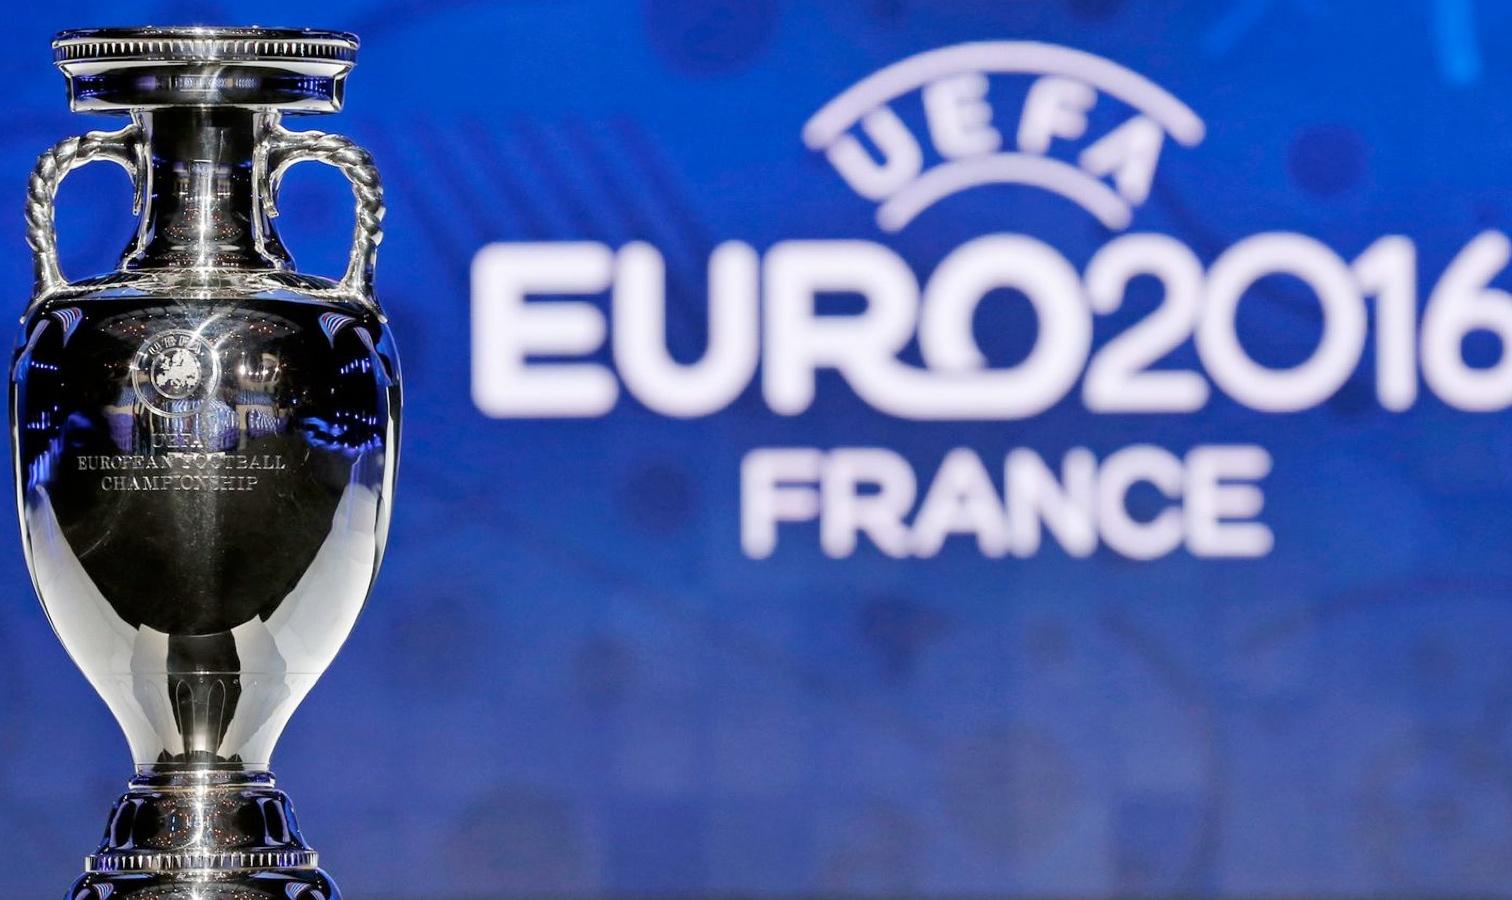 euro 2016 affiche